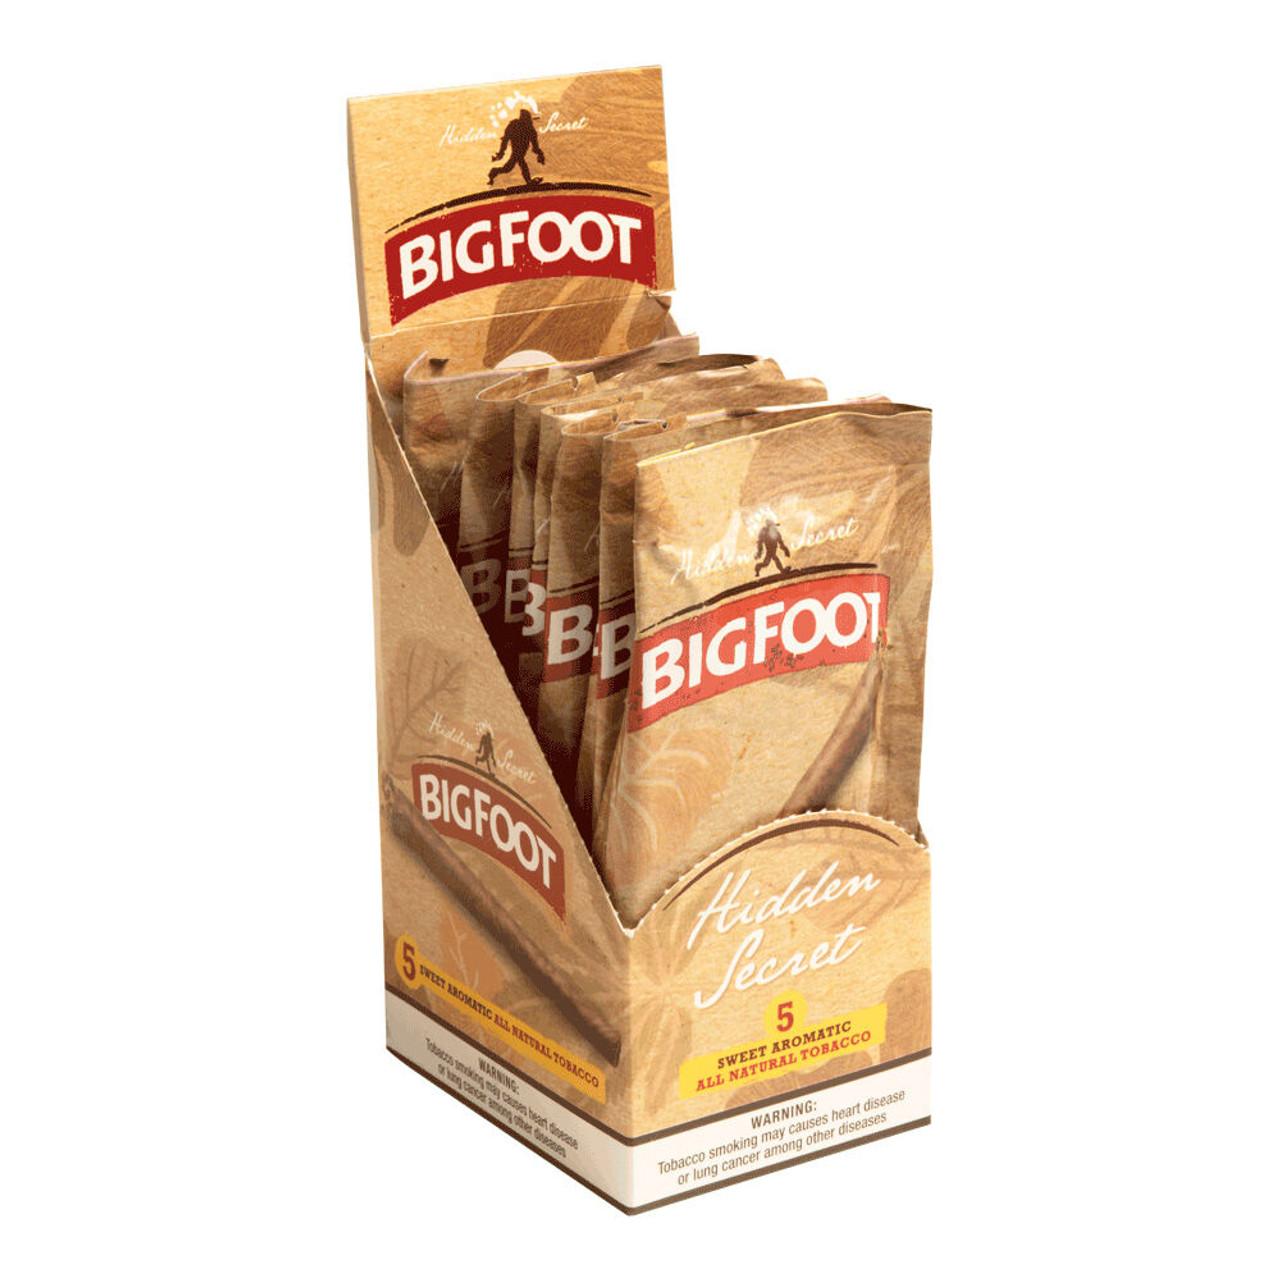 Big Foot Sweet Aromatics Hidden Secret Cigars - 4.5 x 27 (8 Packs of 5 (40 total))